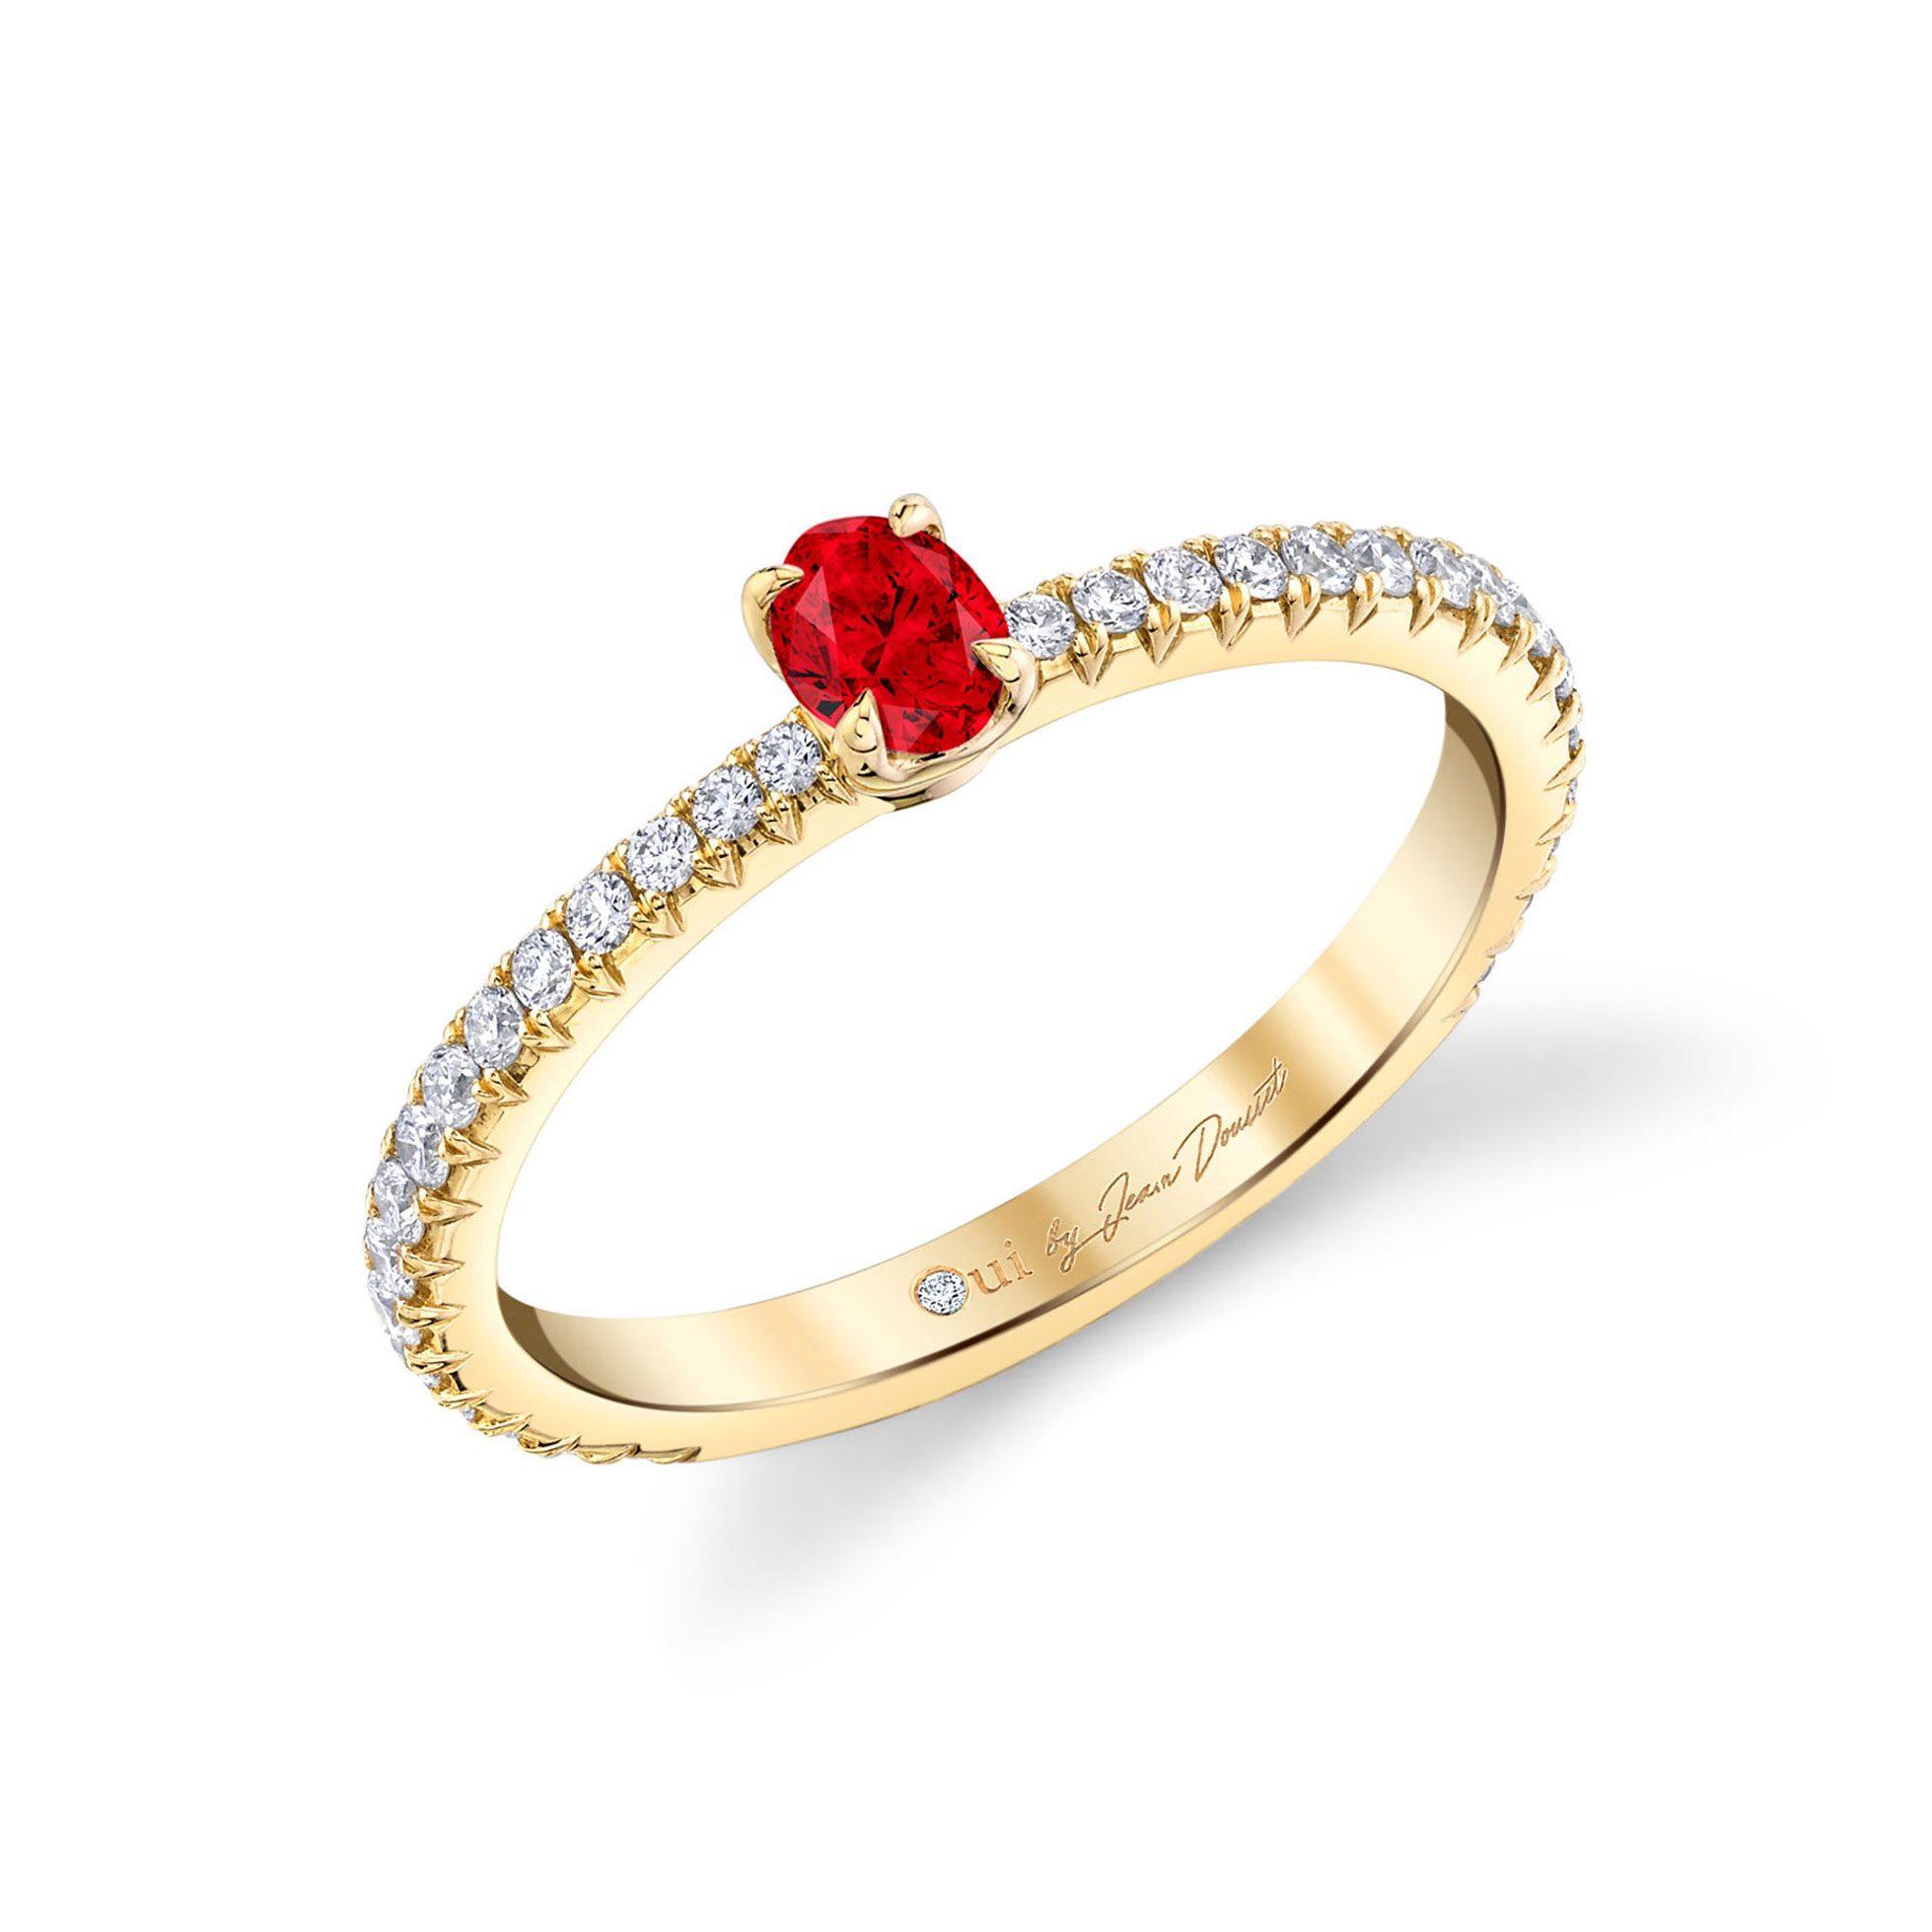 La Petite Oval Ruby Ring diamond pavé band in 18k Yellow Gold Profile View by Oui by Jean Dousset